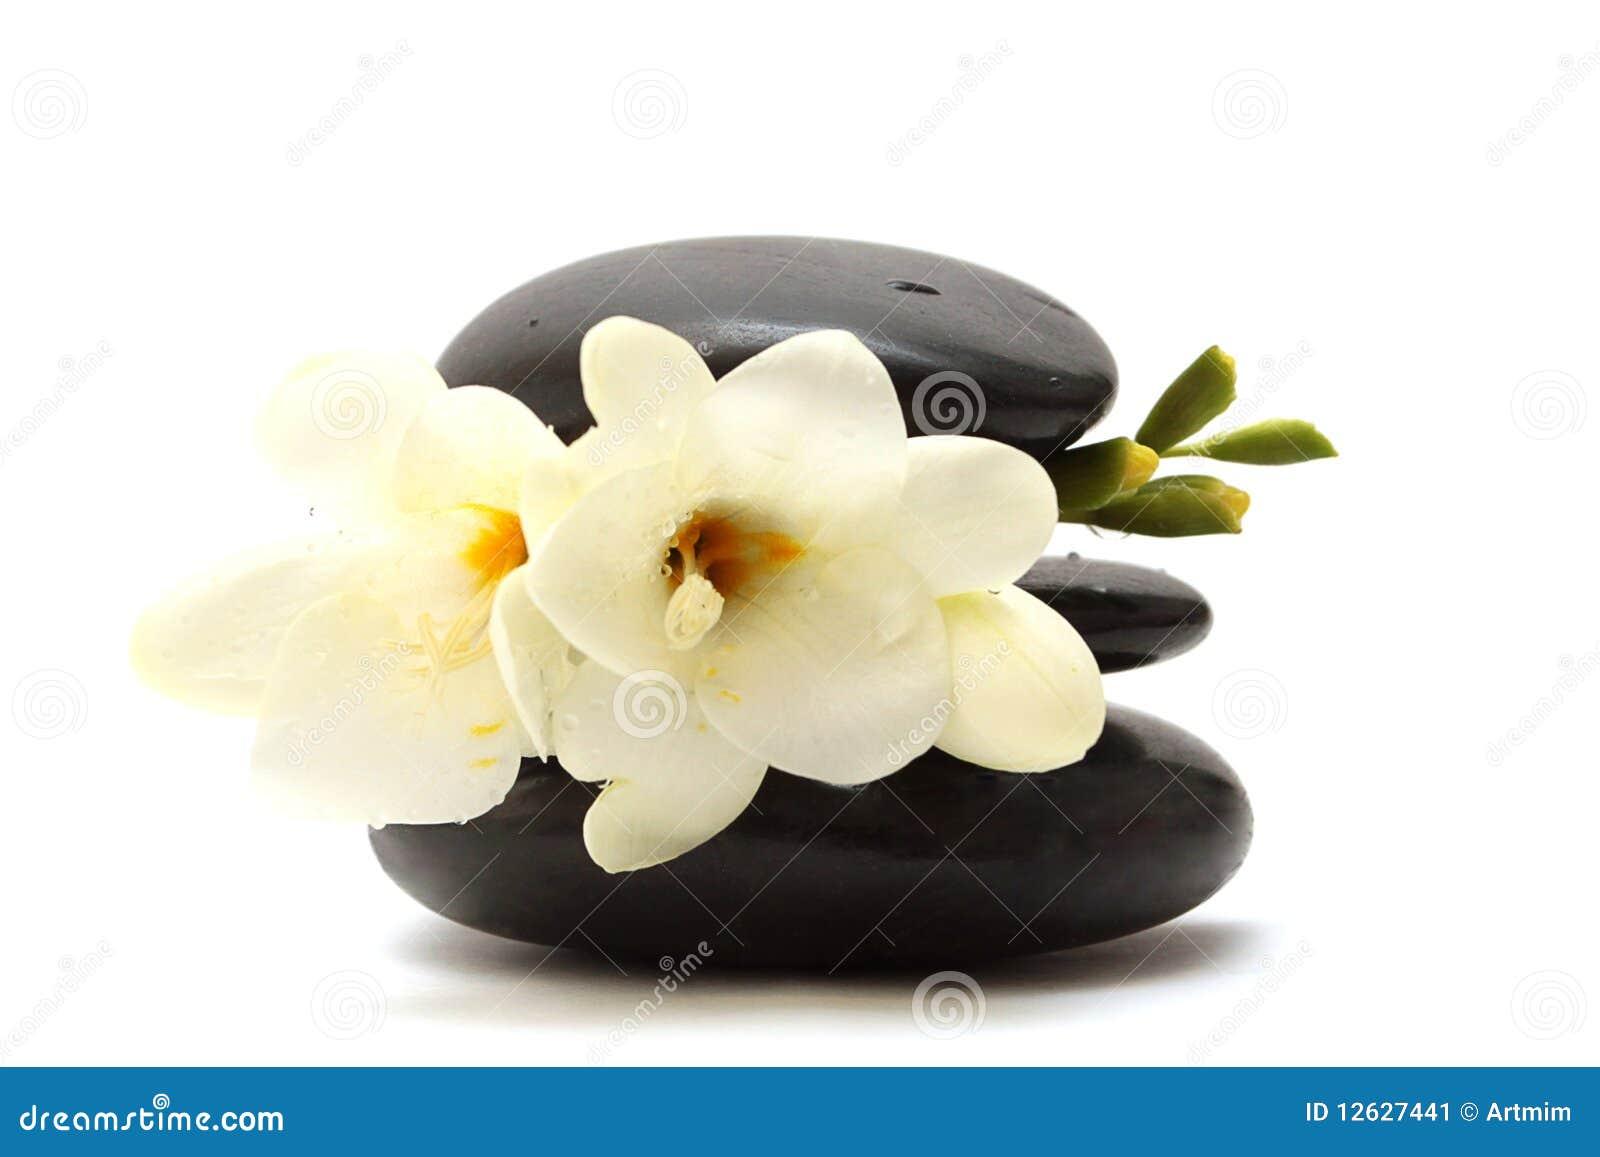 Black stones and white flower stock image image of medicine download black stones and white flower stock image image of medicine leaves 12627441 mightylinksfo